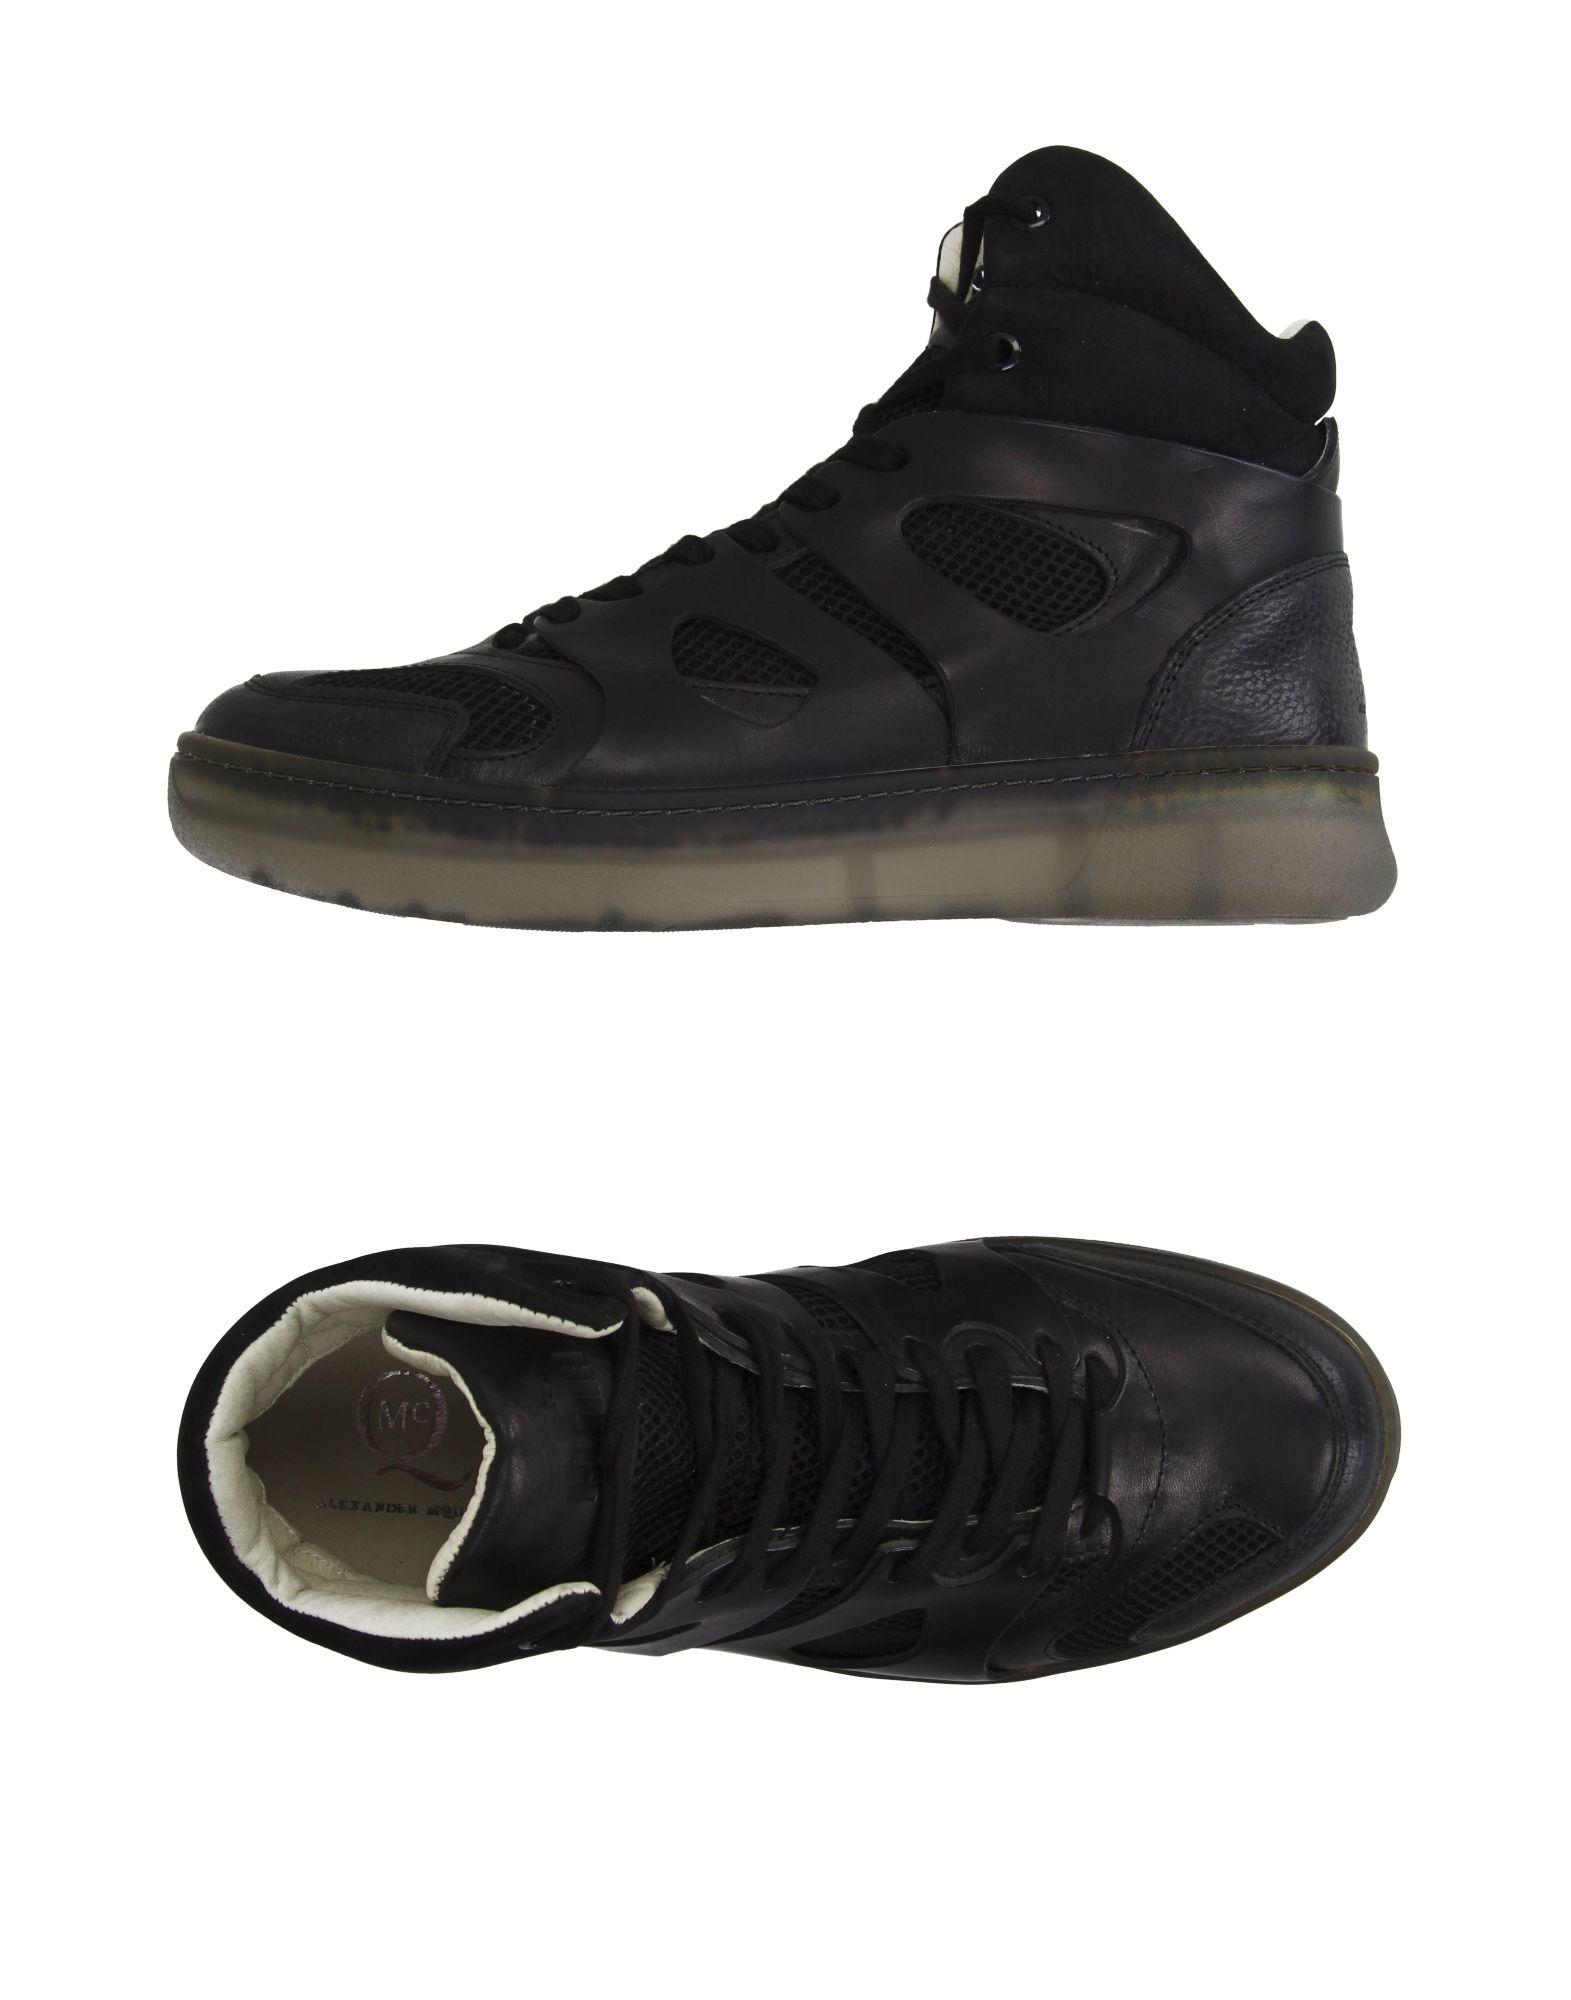 Sneakers Mcq Puma Homme - Sneakers Mcq Puma  Noir Super rabais